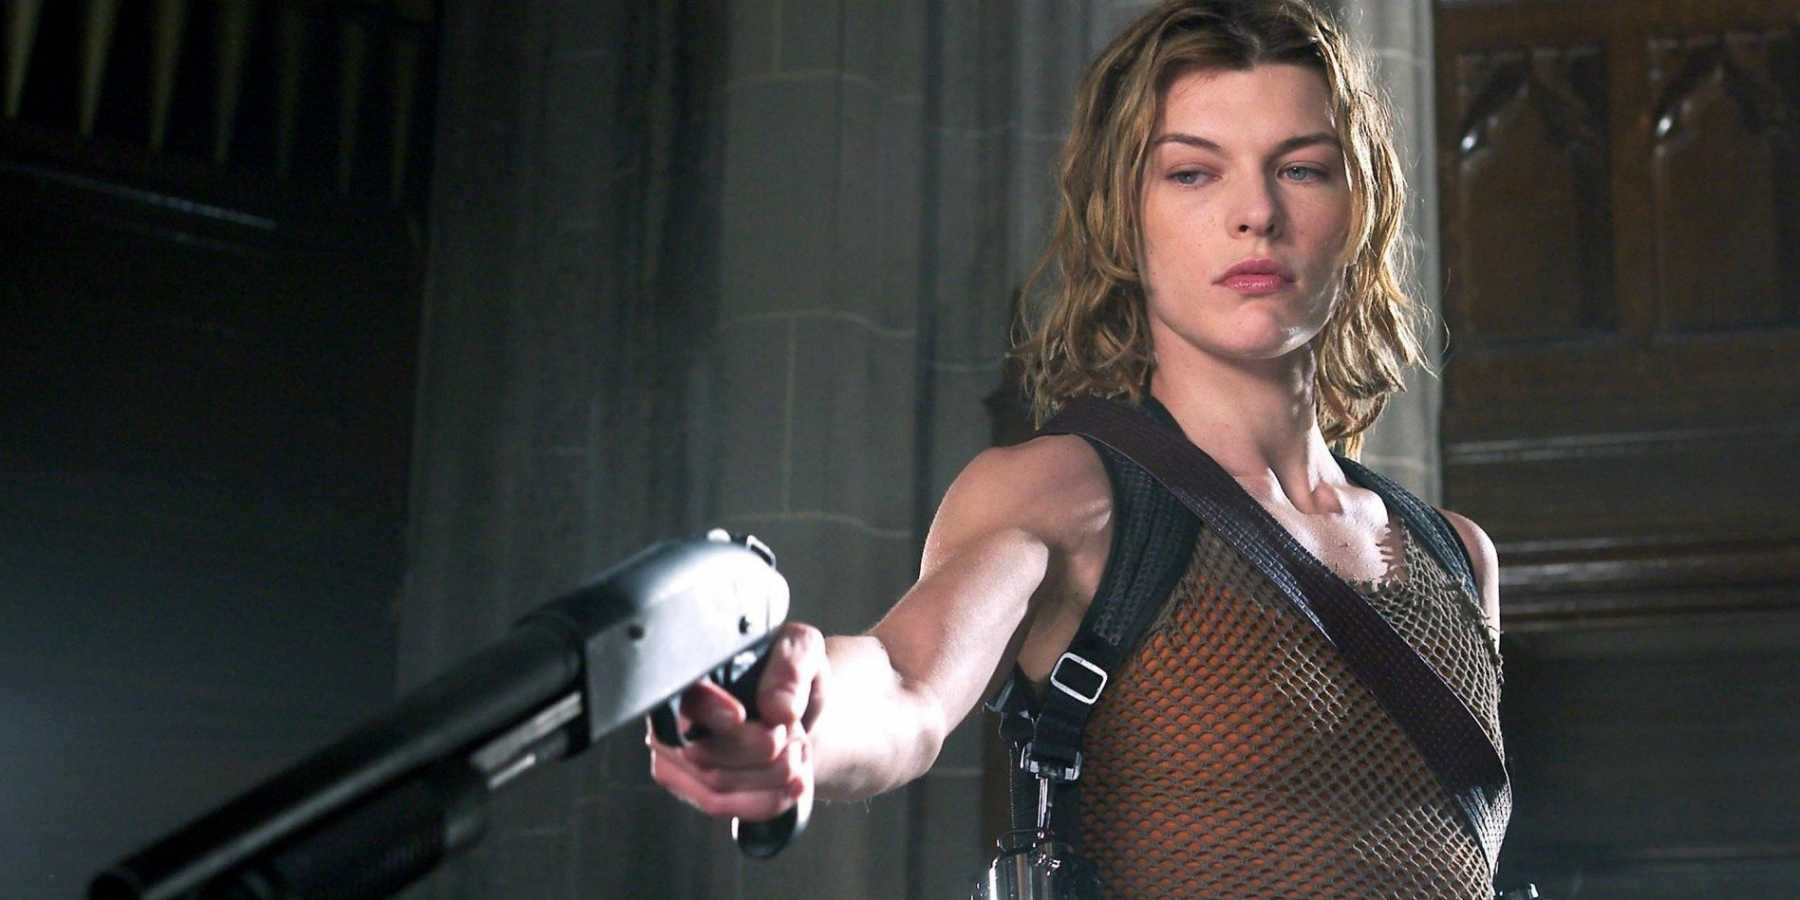 Milla Jovovich Joins Hellboy Cast | Milla Jovovich